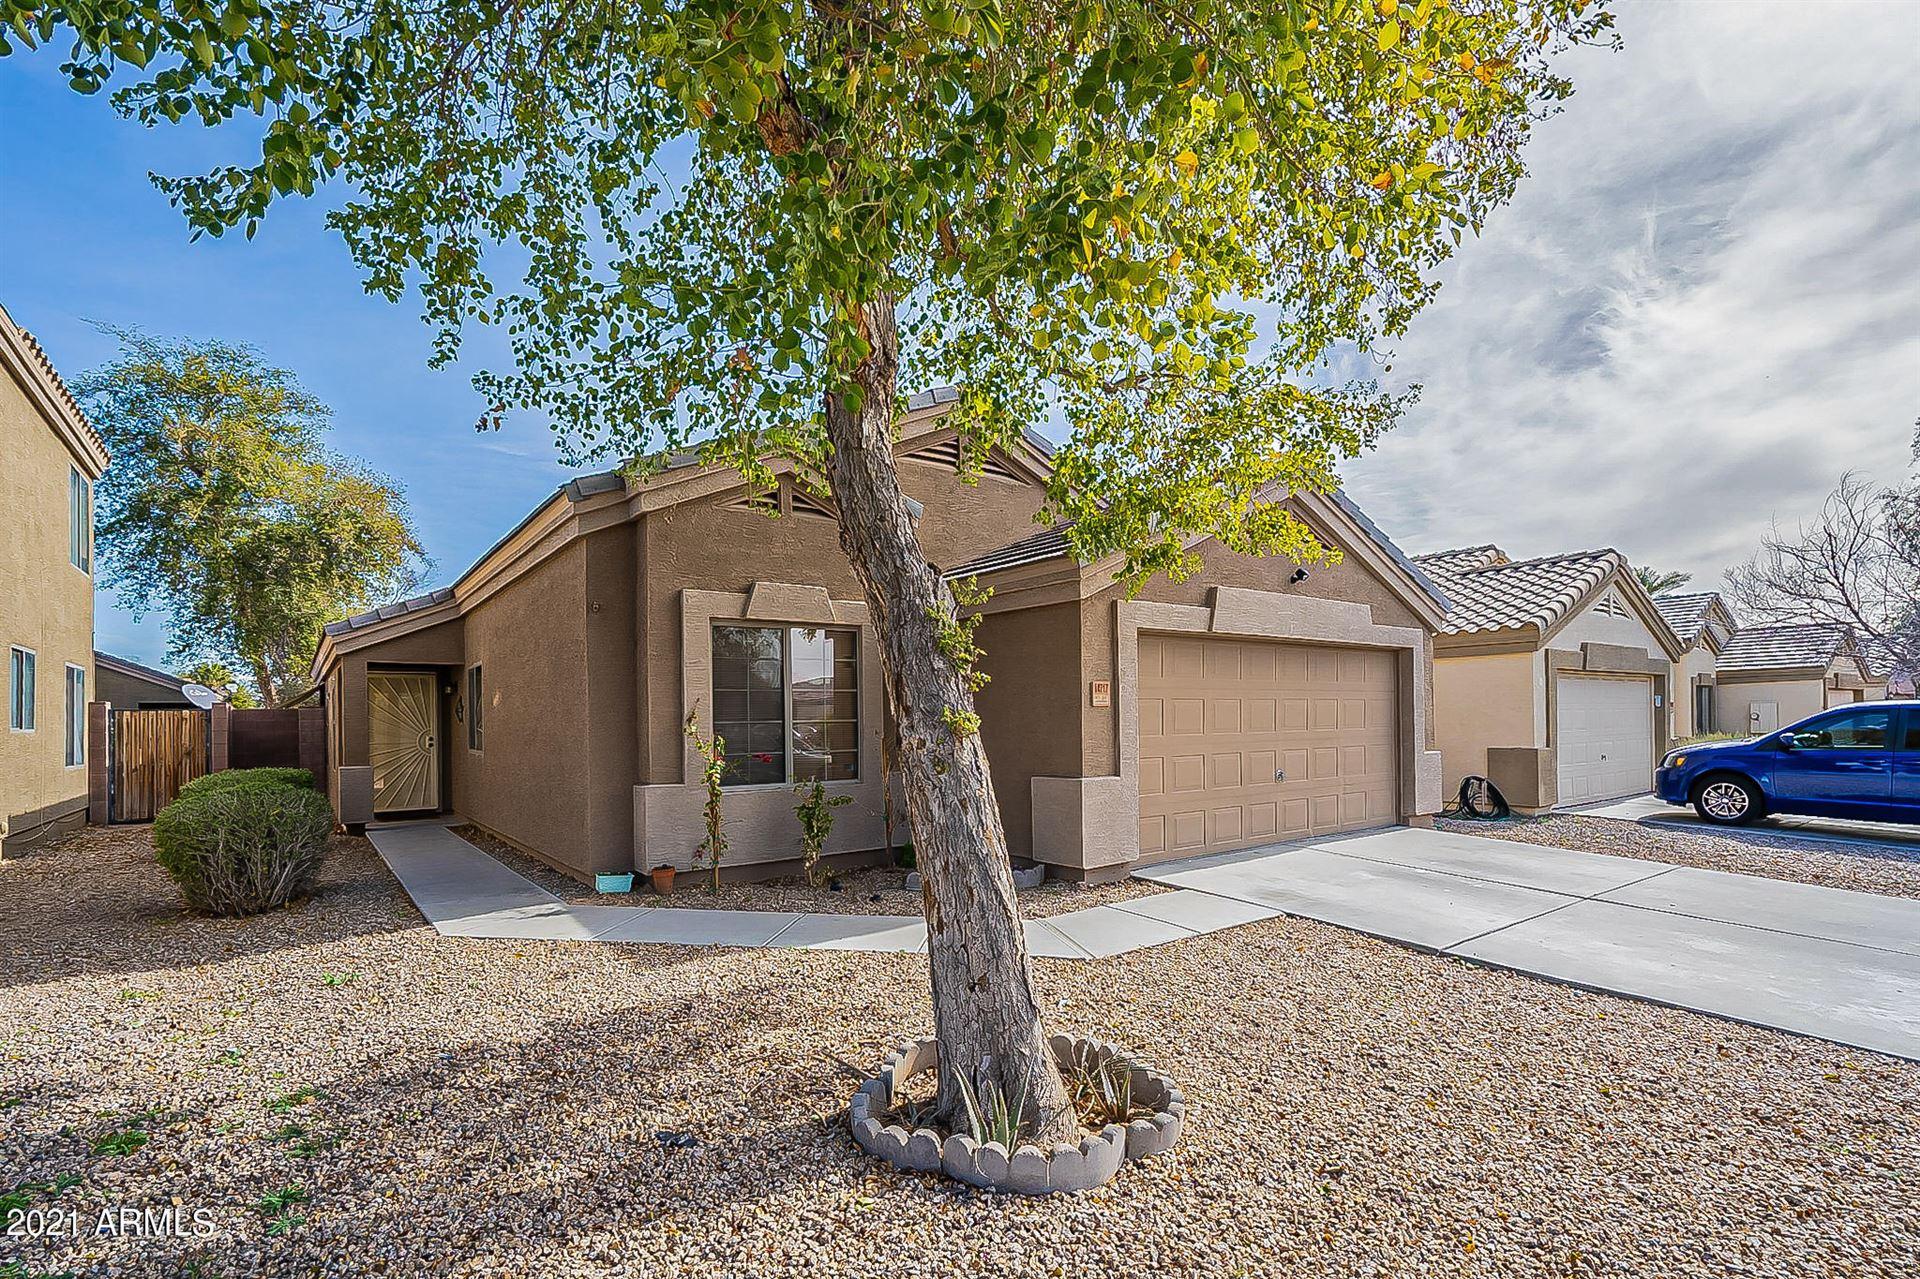 Photo of 14717 N 125TH Avenue, El Mirage, AZ 85335 (MLS # 6195807)